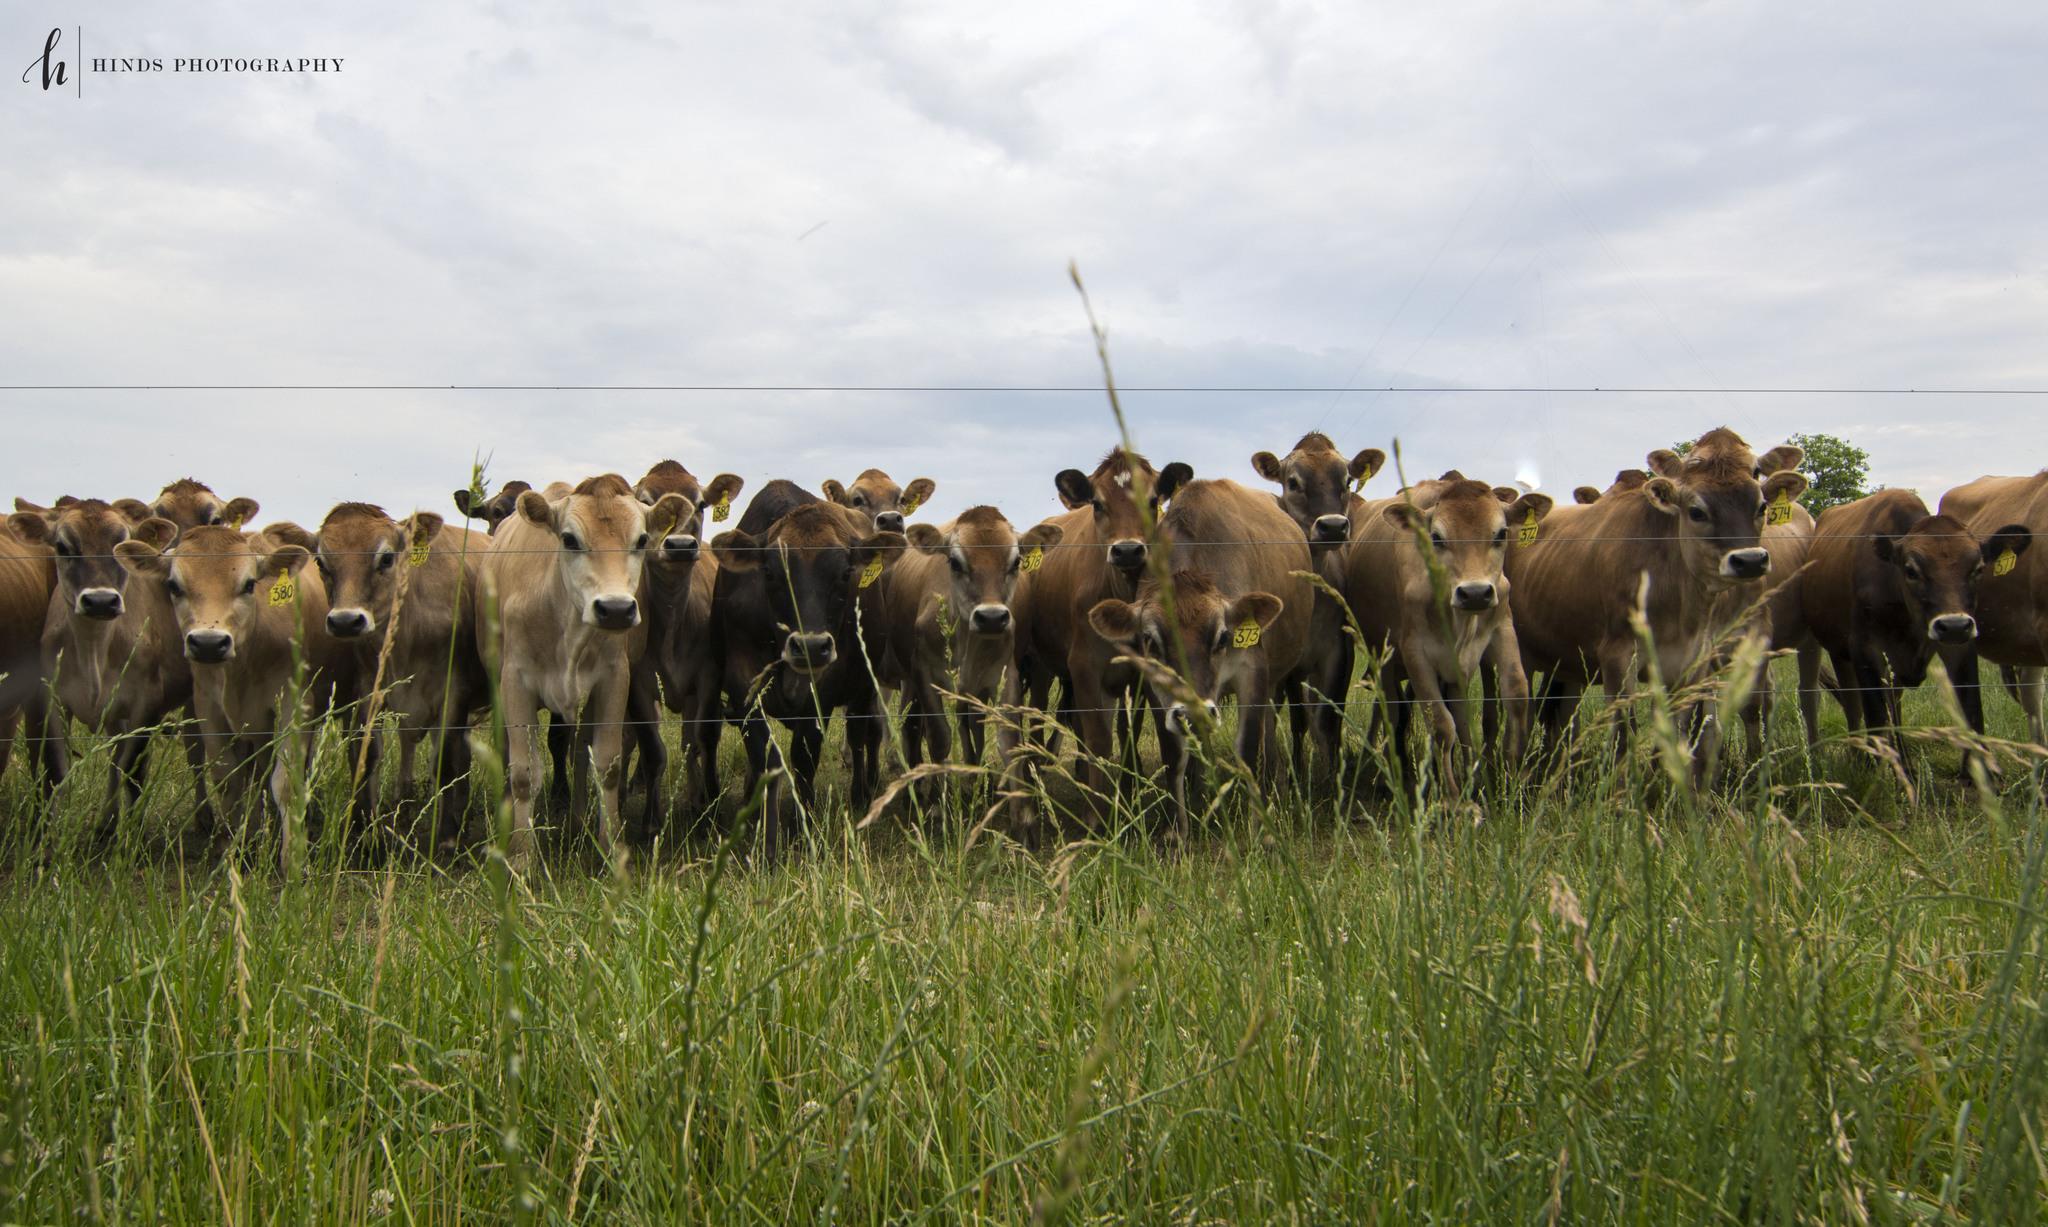 Parade of Cows